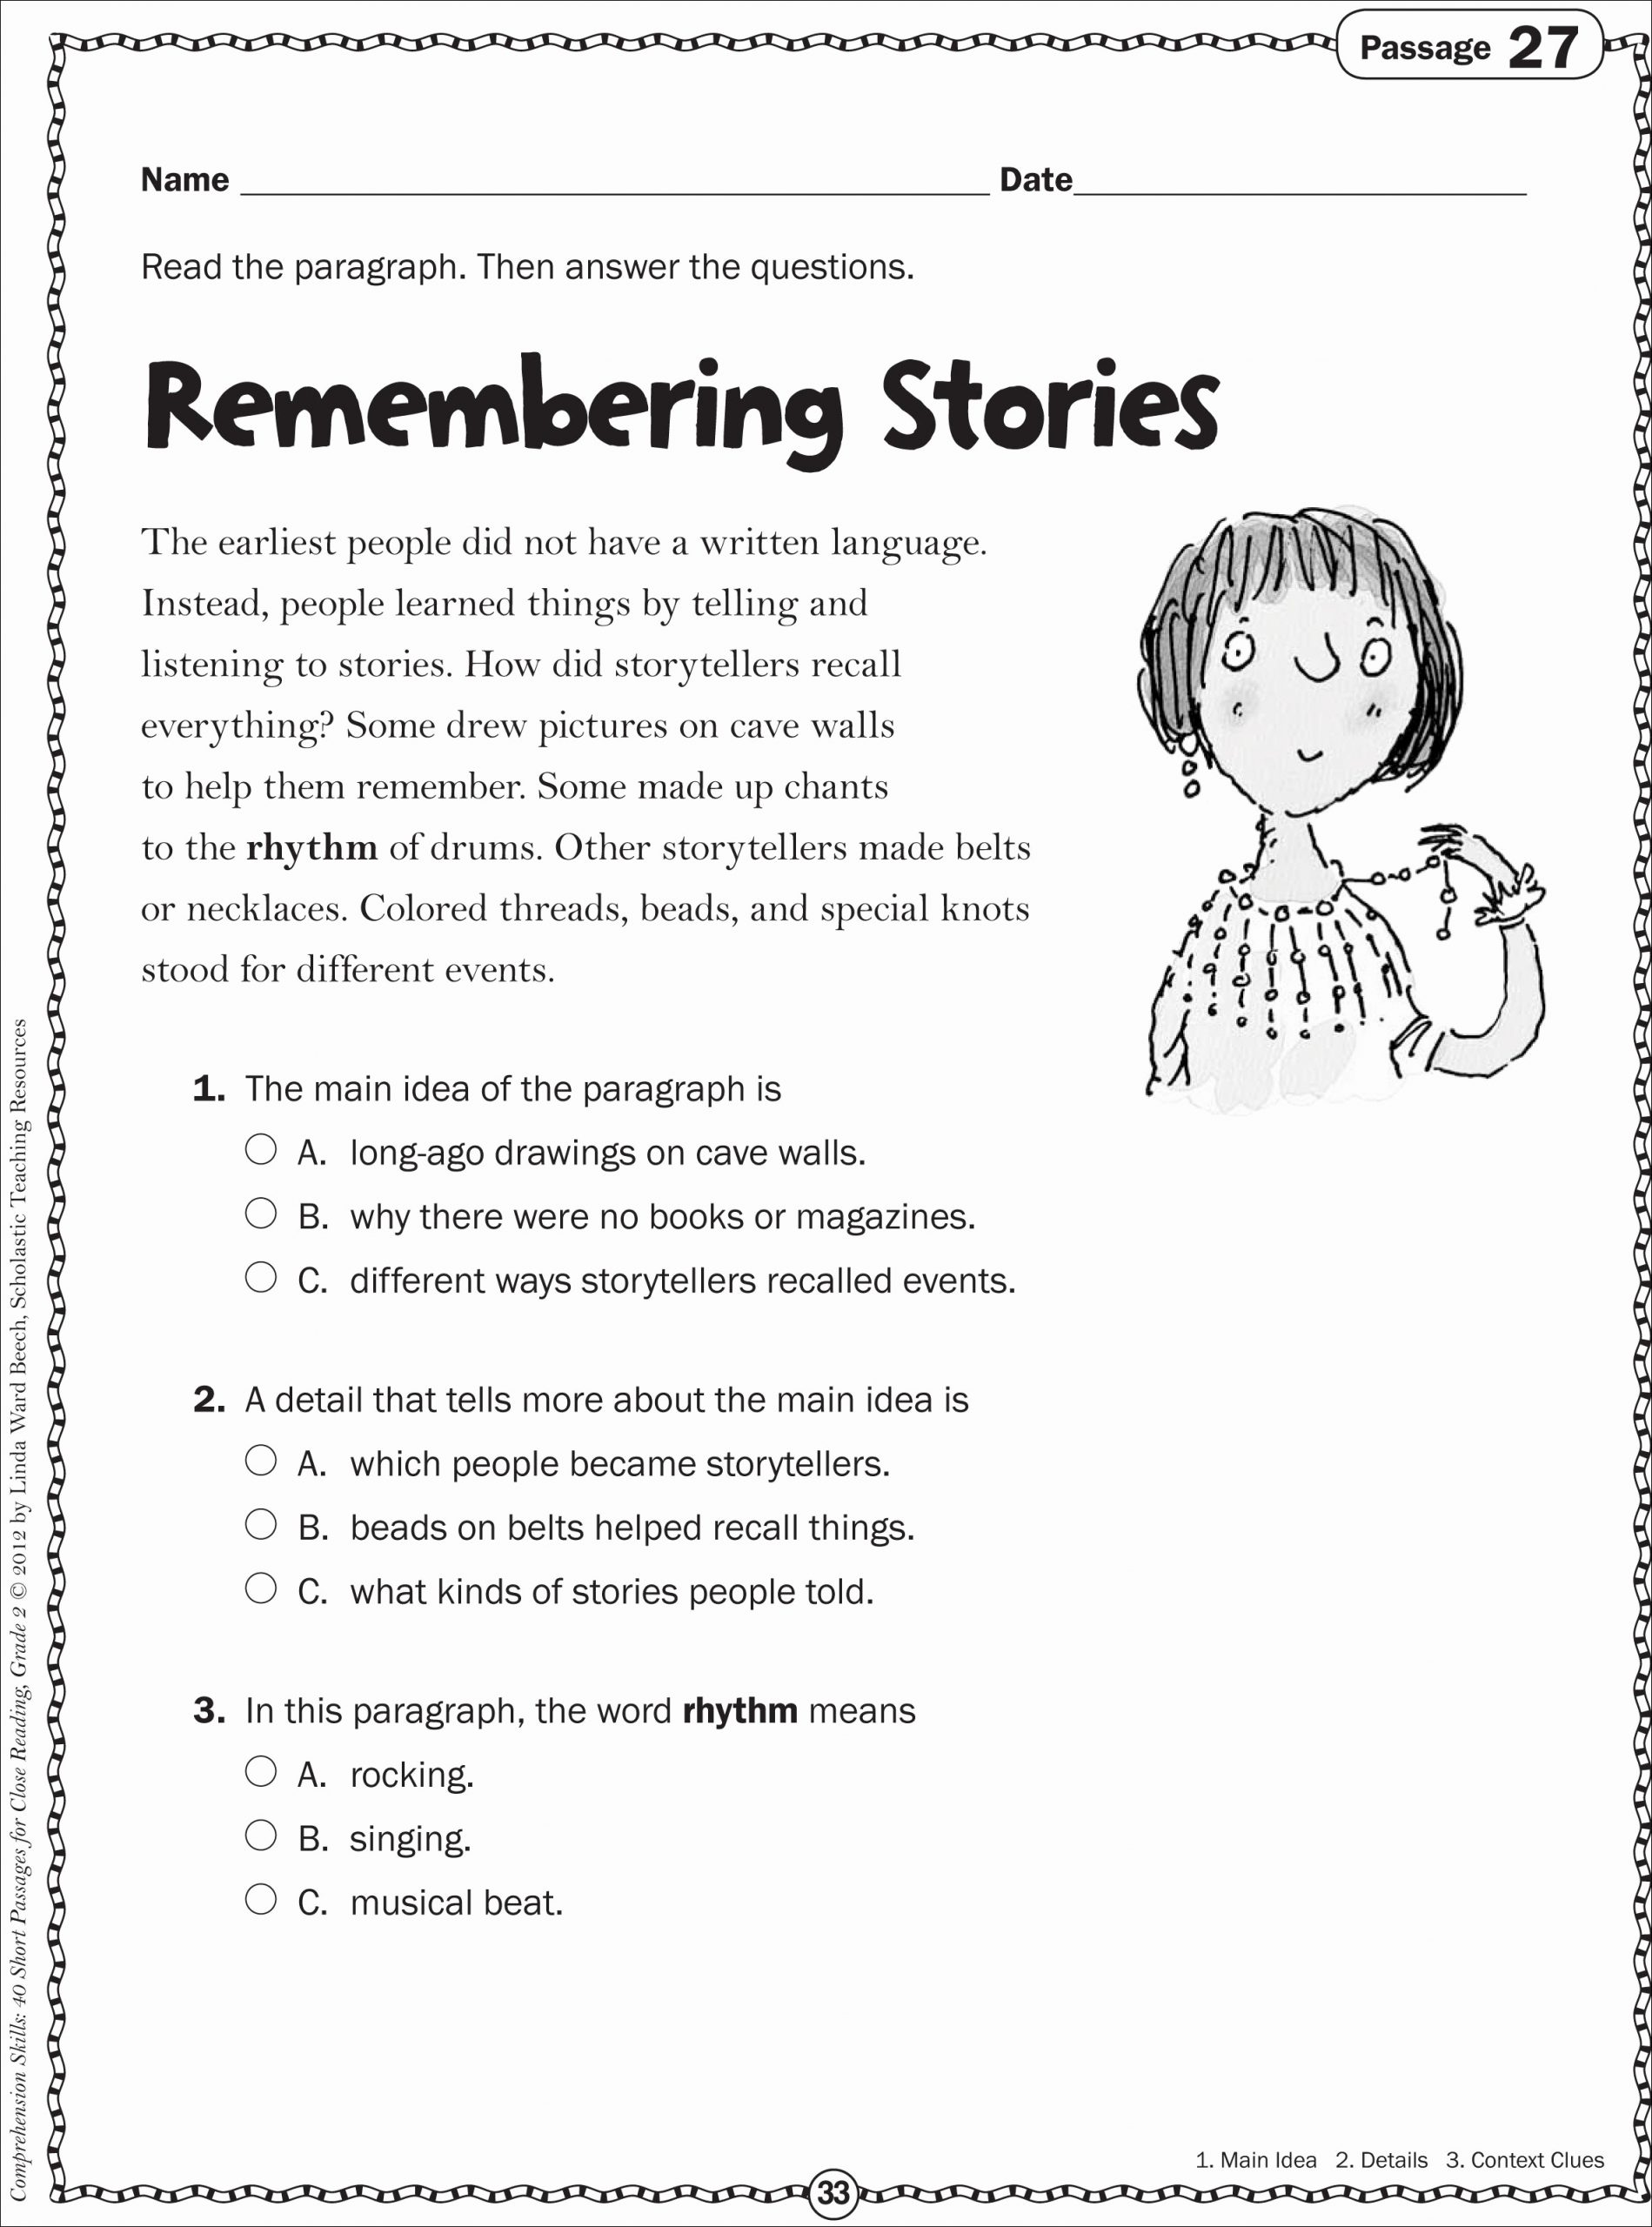 3rd Grade Main Idea Worksheets Best Of 10 attractive Main Idea and Details Worksheets 3rd Grade 2020